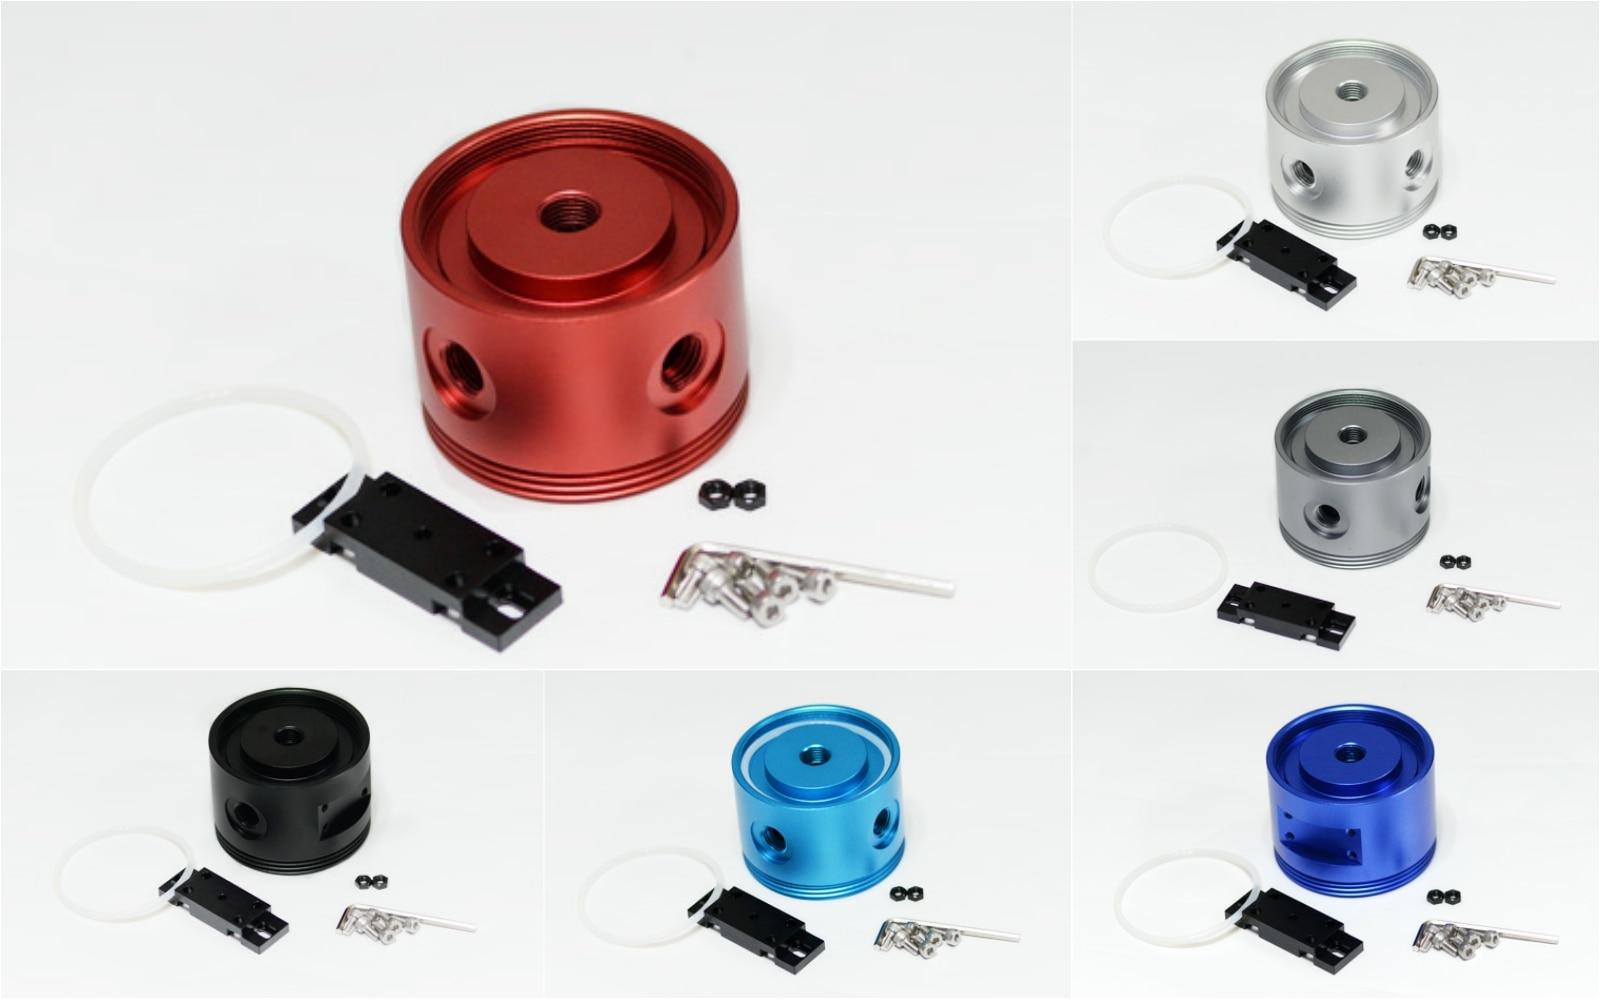 Barrow Aluminium Alloy Pump Mod Cover Top for D5/SPG40A LD5BTZ-V2